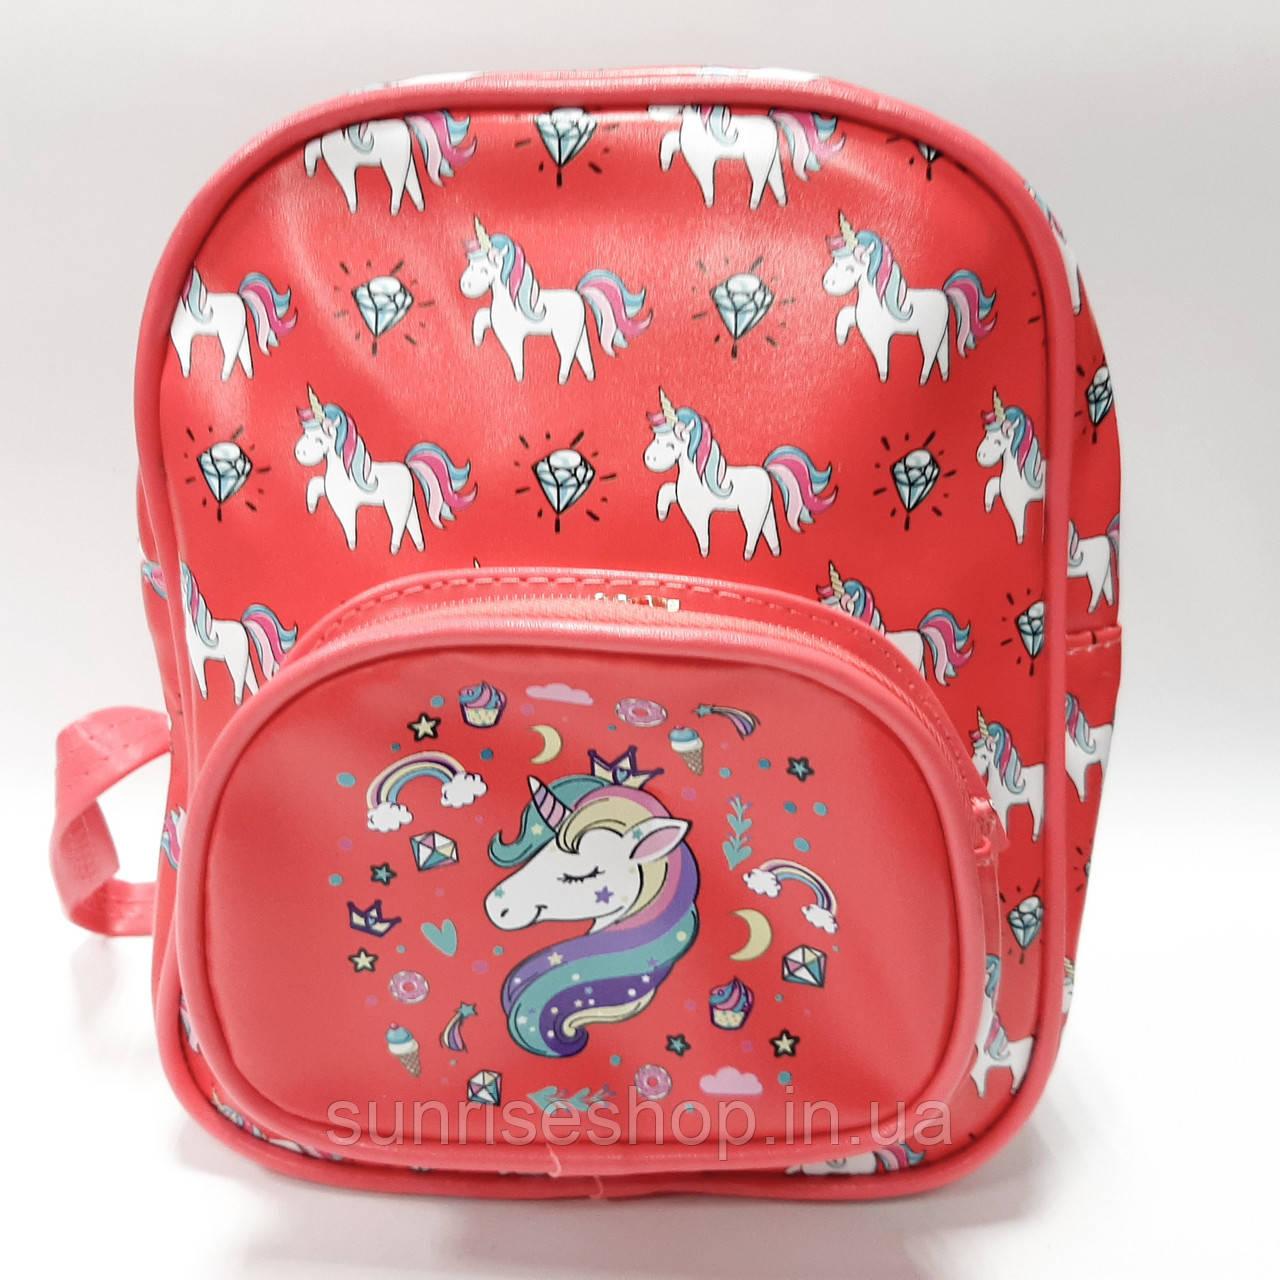 Рюкзак для девочки Единорог